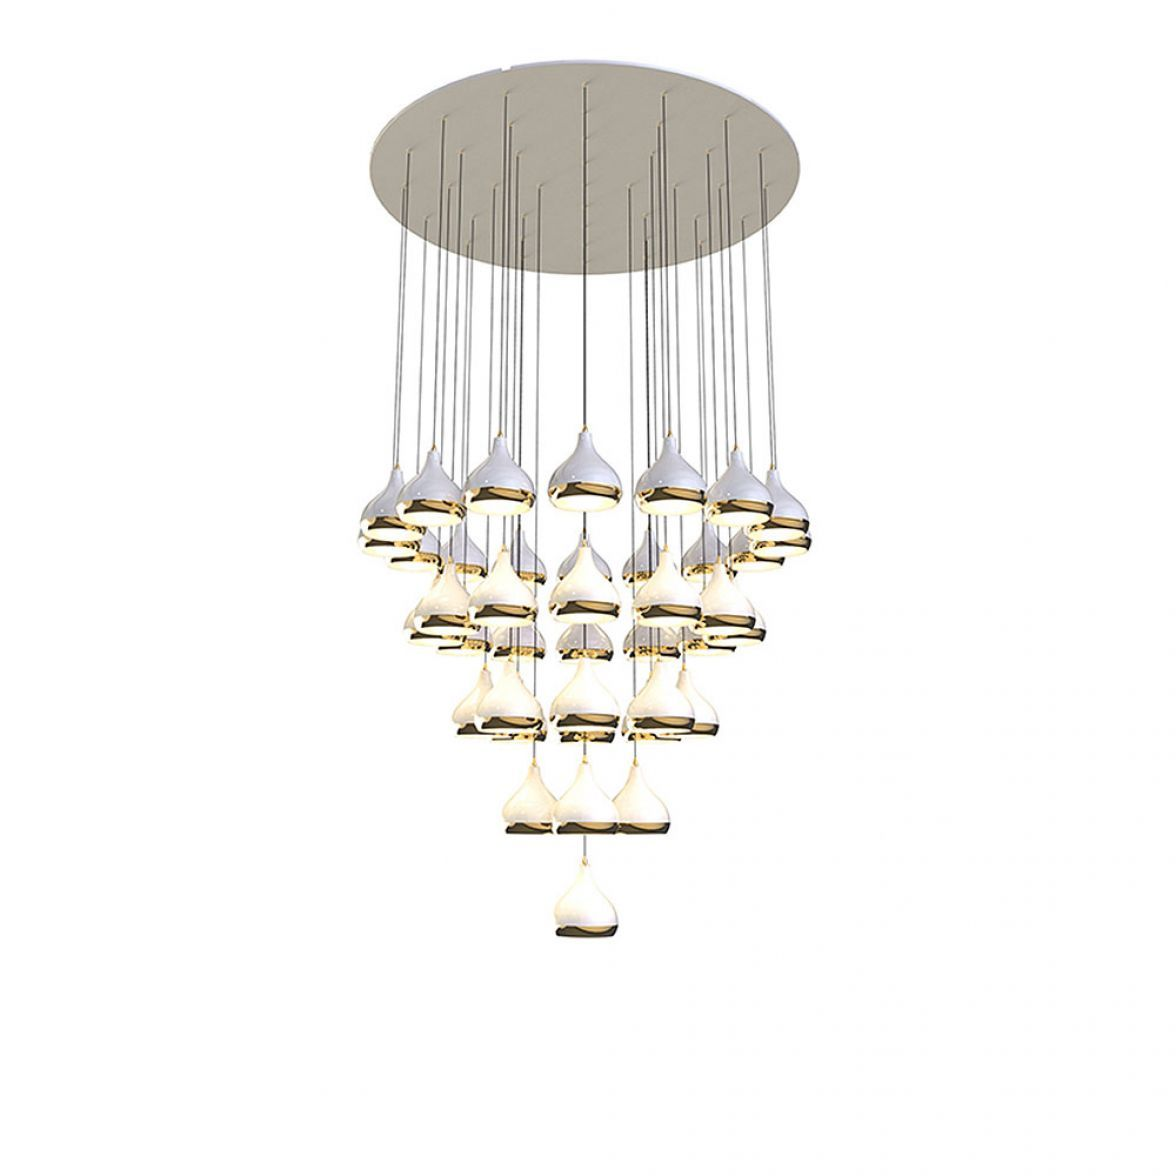 Hanna chandelier фото цена